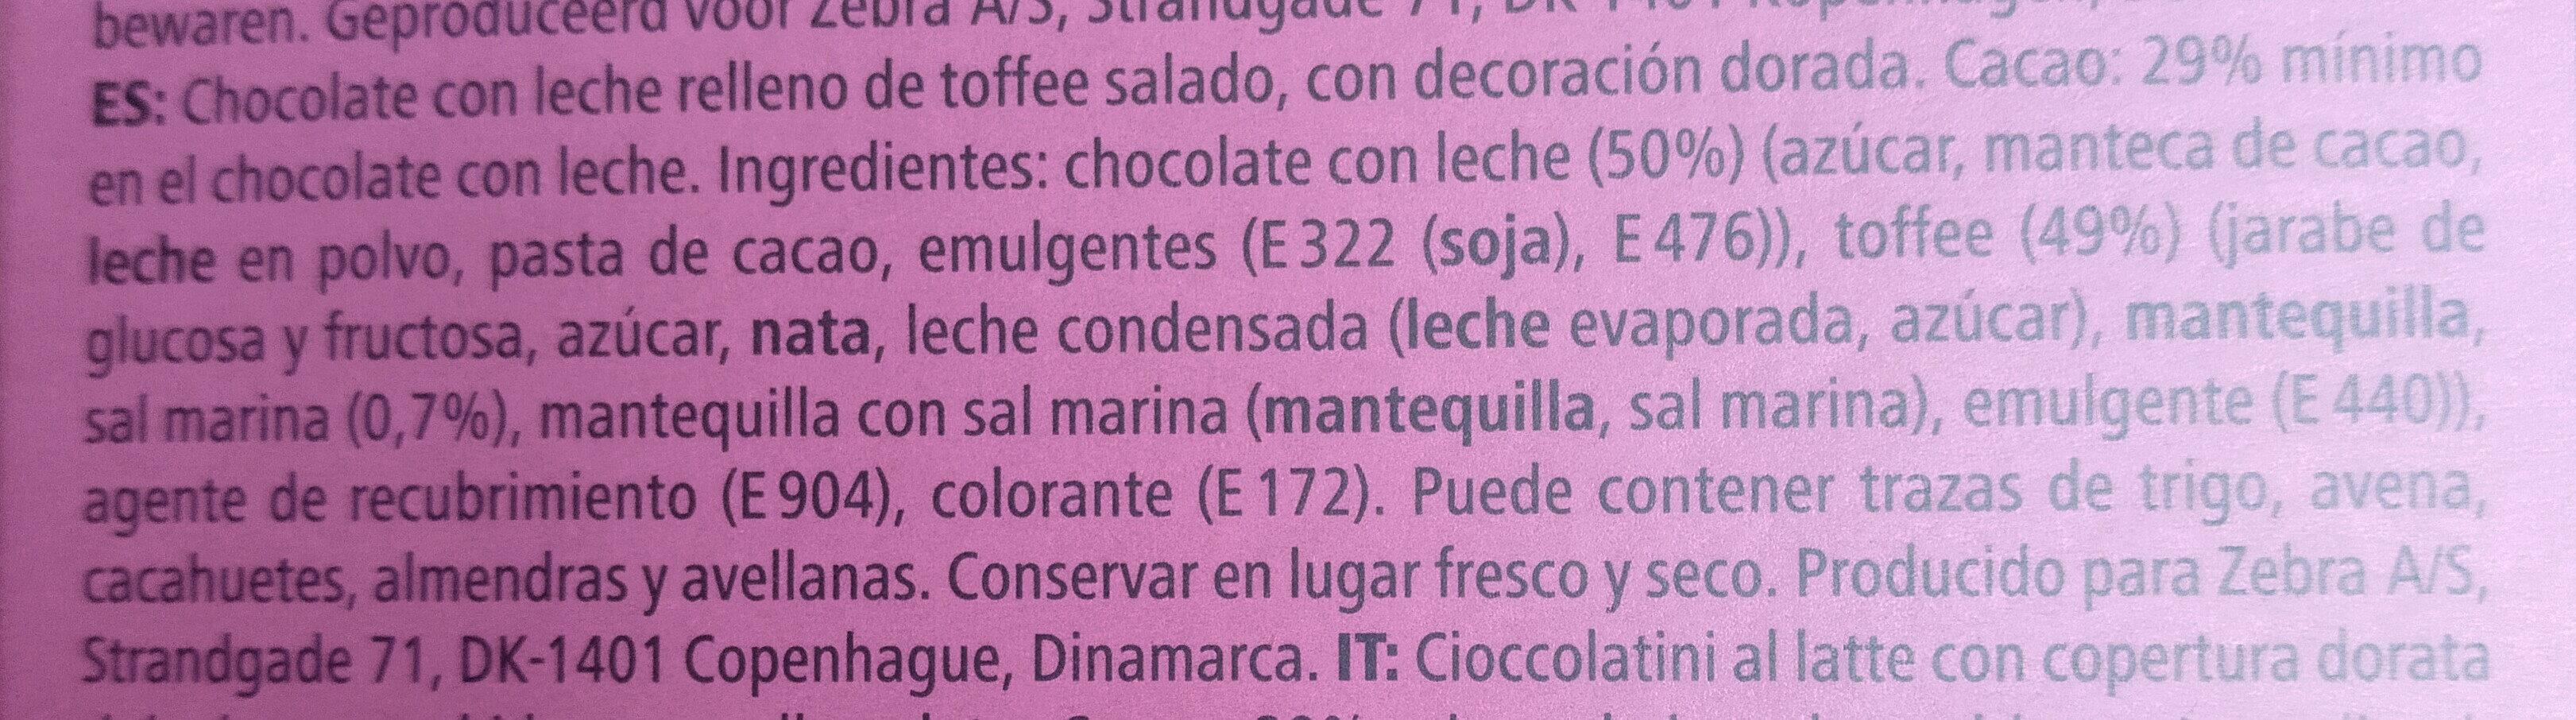 Milk chocolates salty caramel flavour - Ingredientes